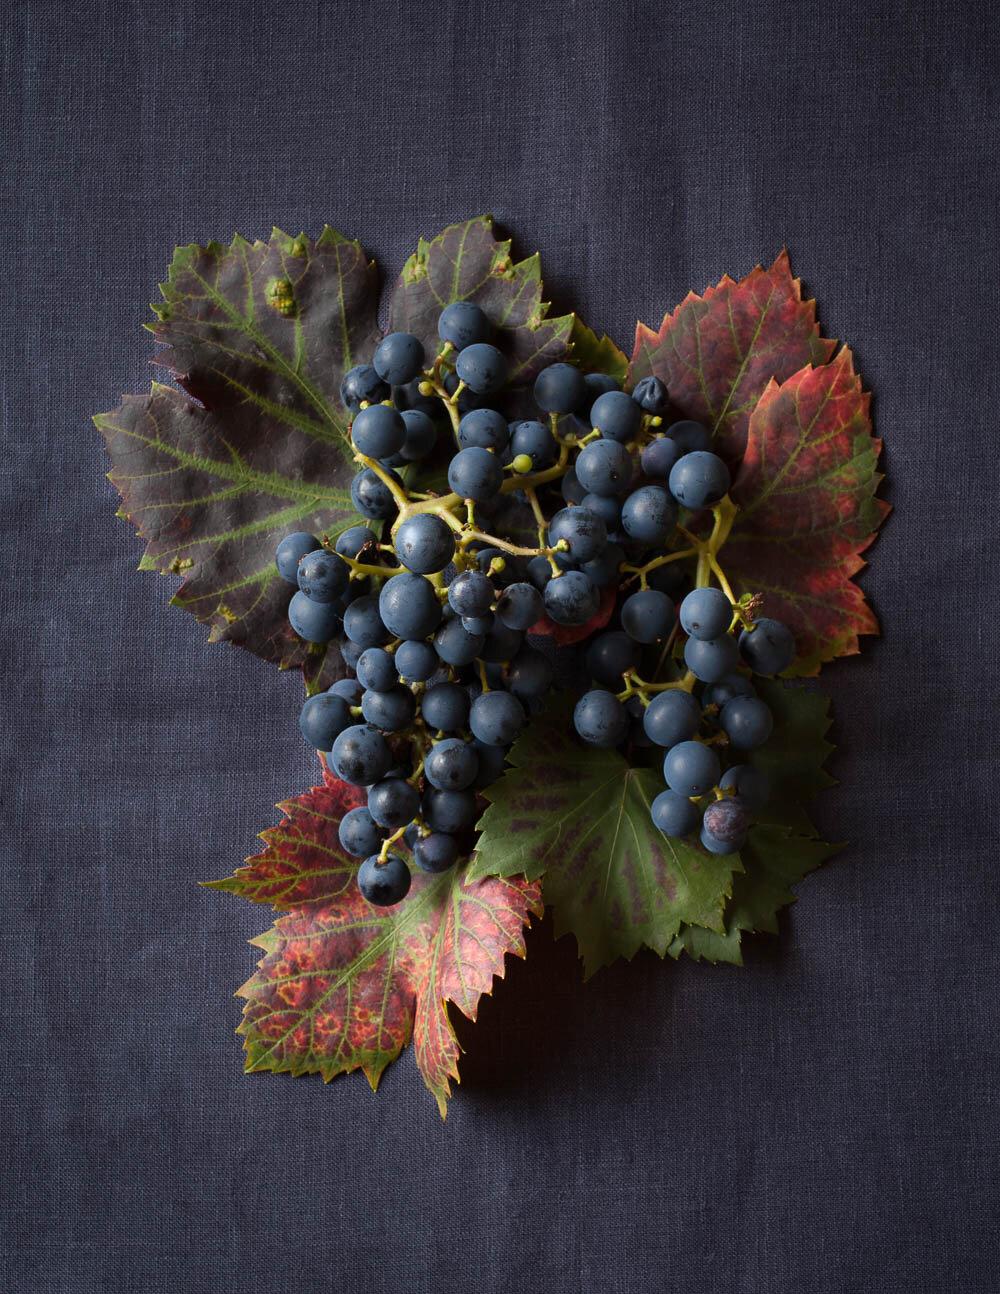 emmatsrobinson-fieldtofork-grapevine20190918-_MG_5802.jpg